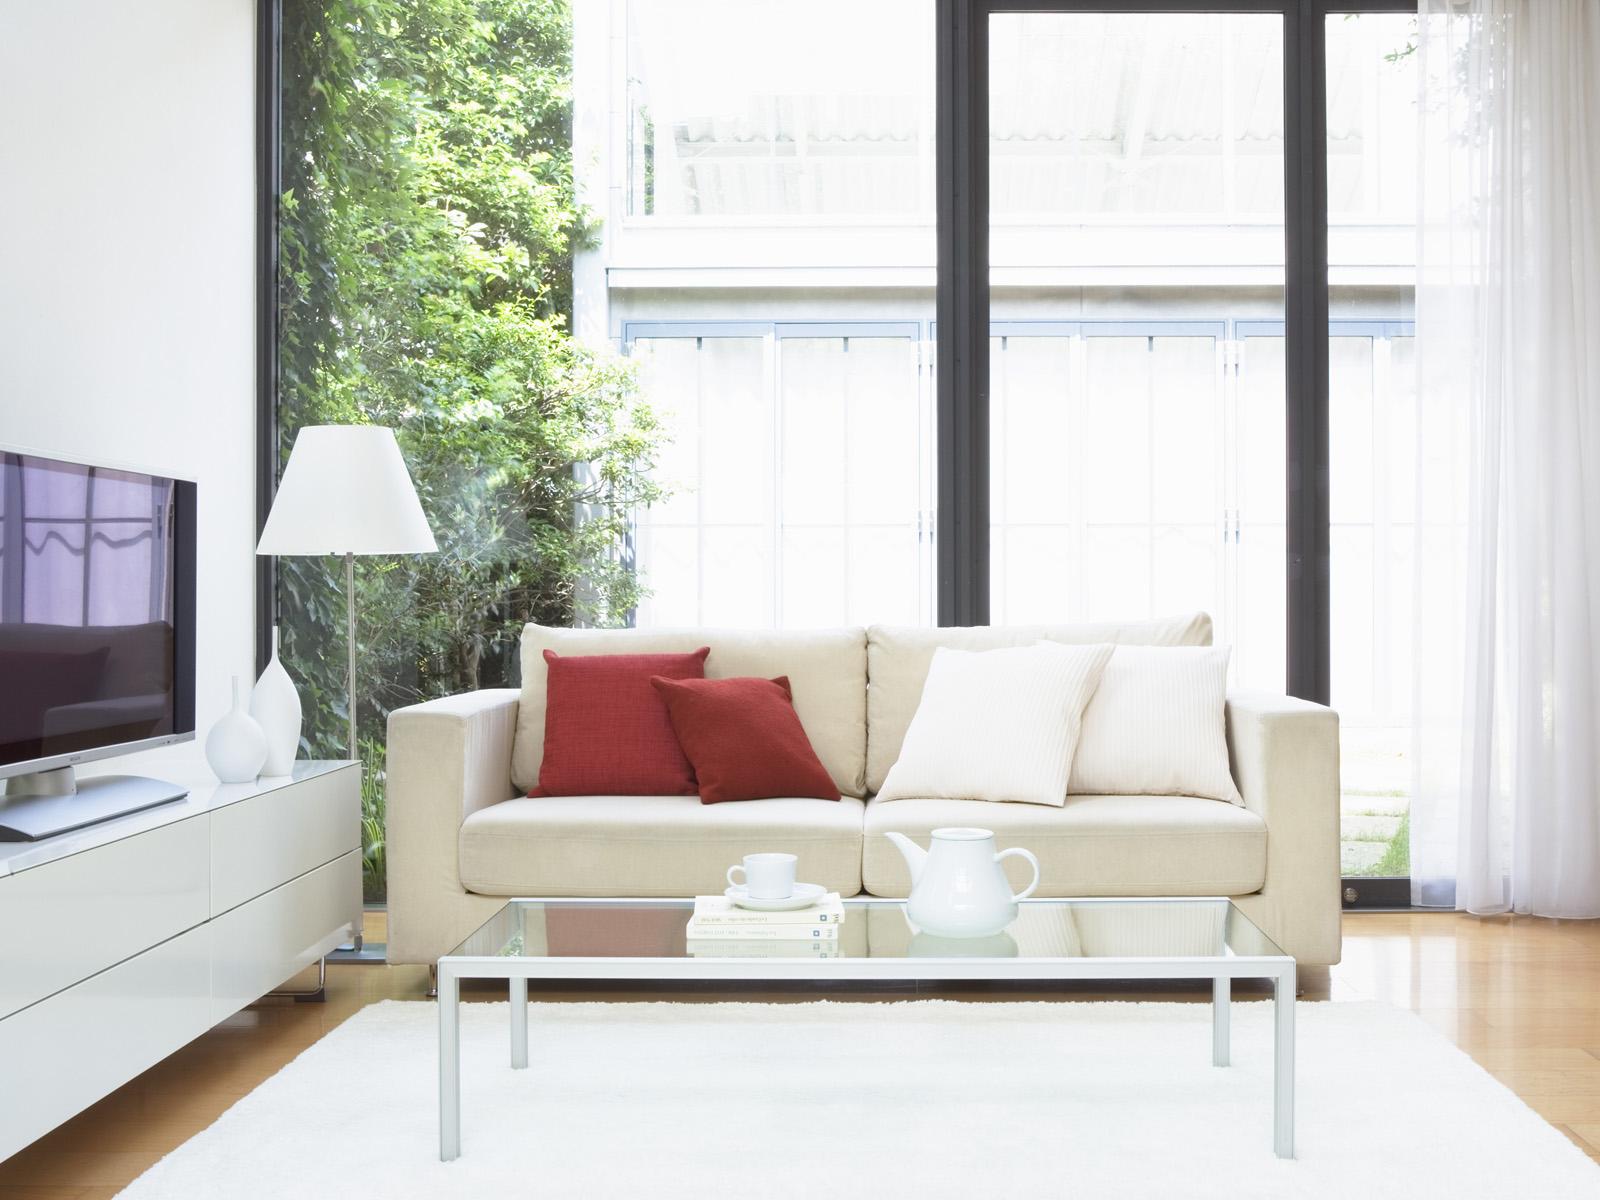 INTERIOR DESIGN Modern interior wallpaper 1600x1200